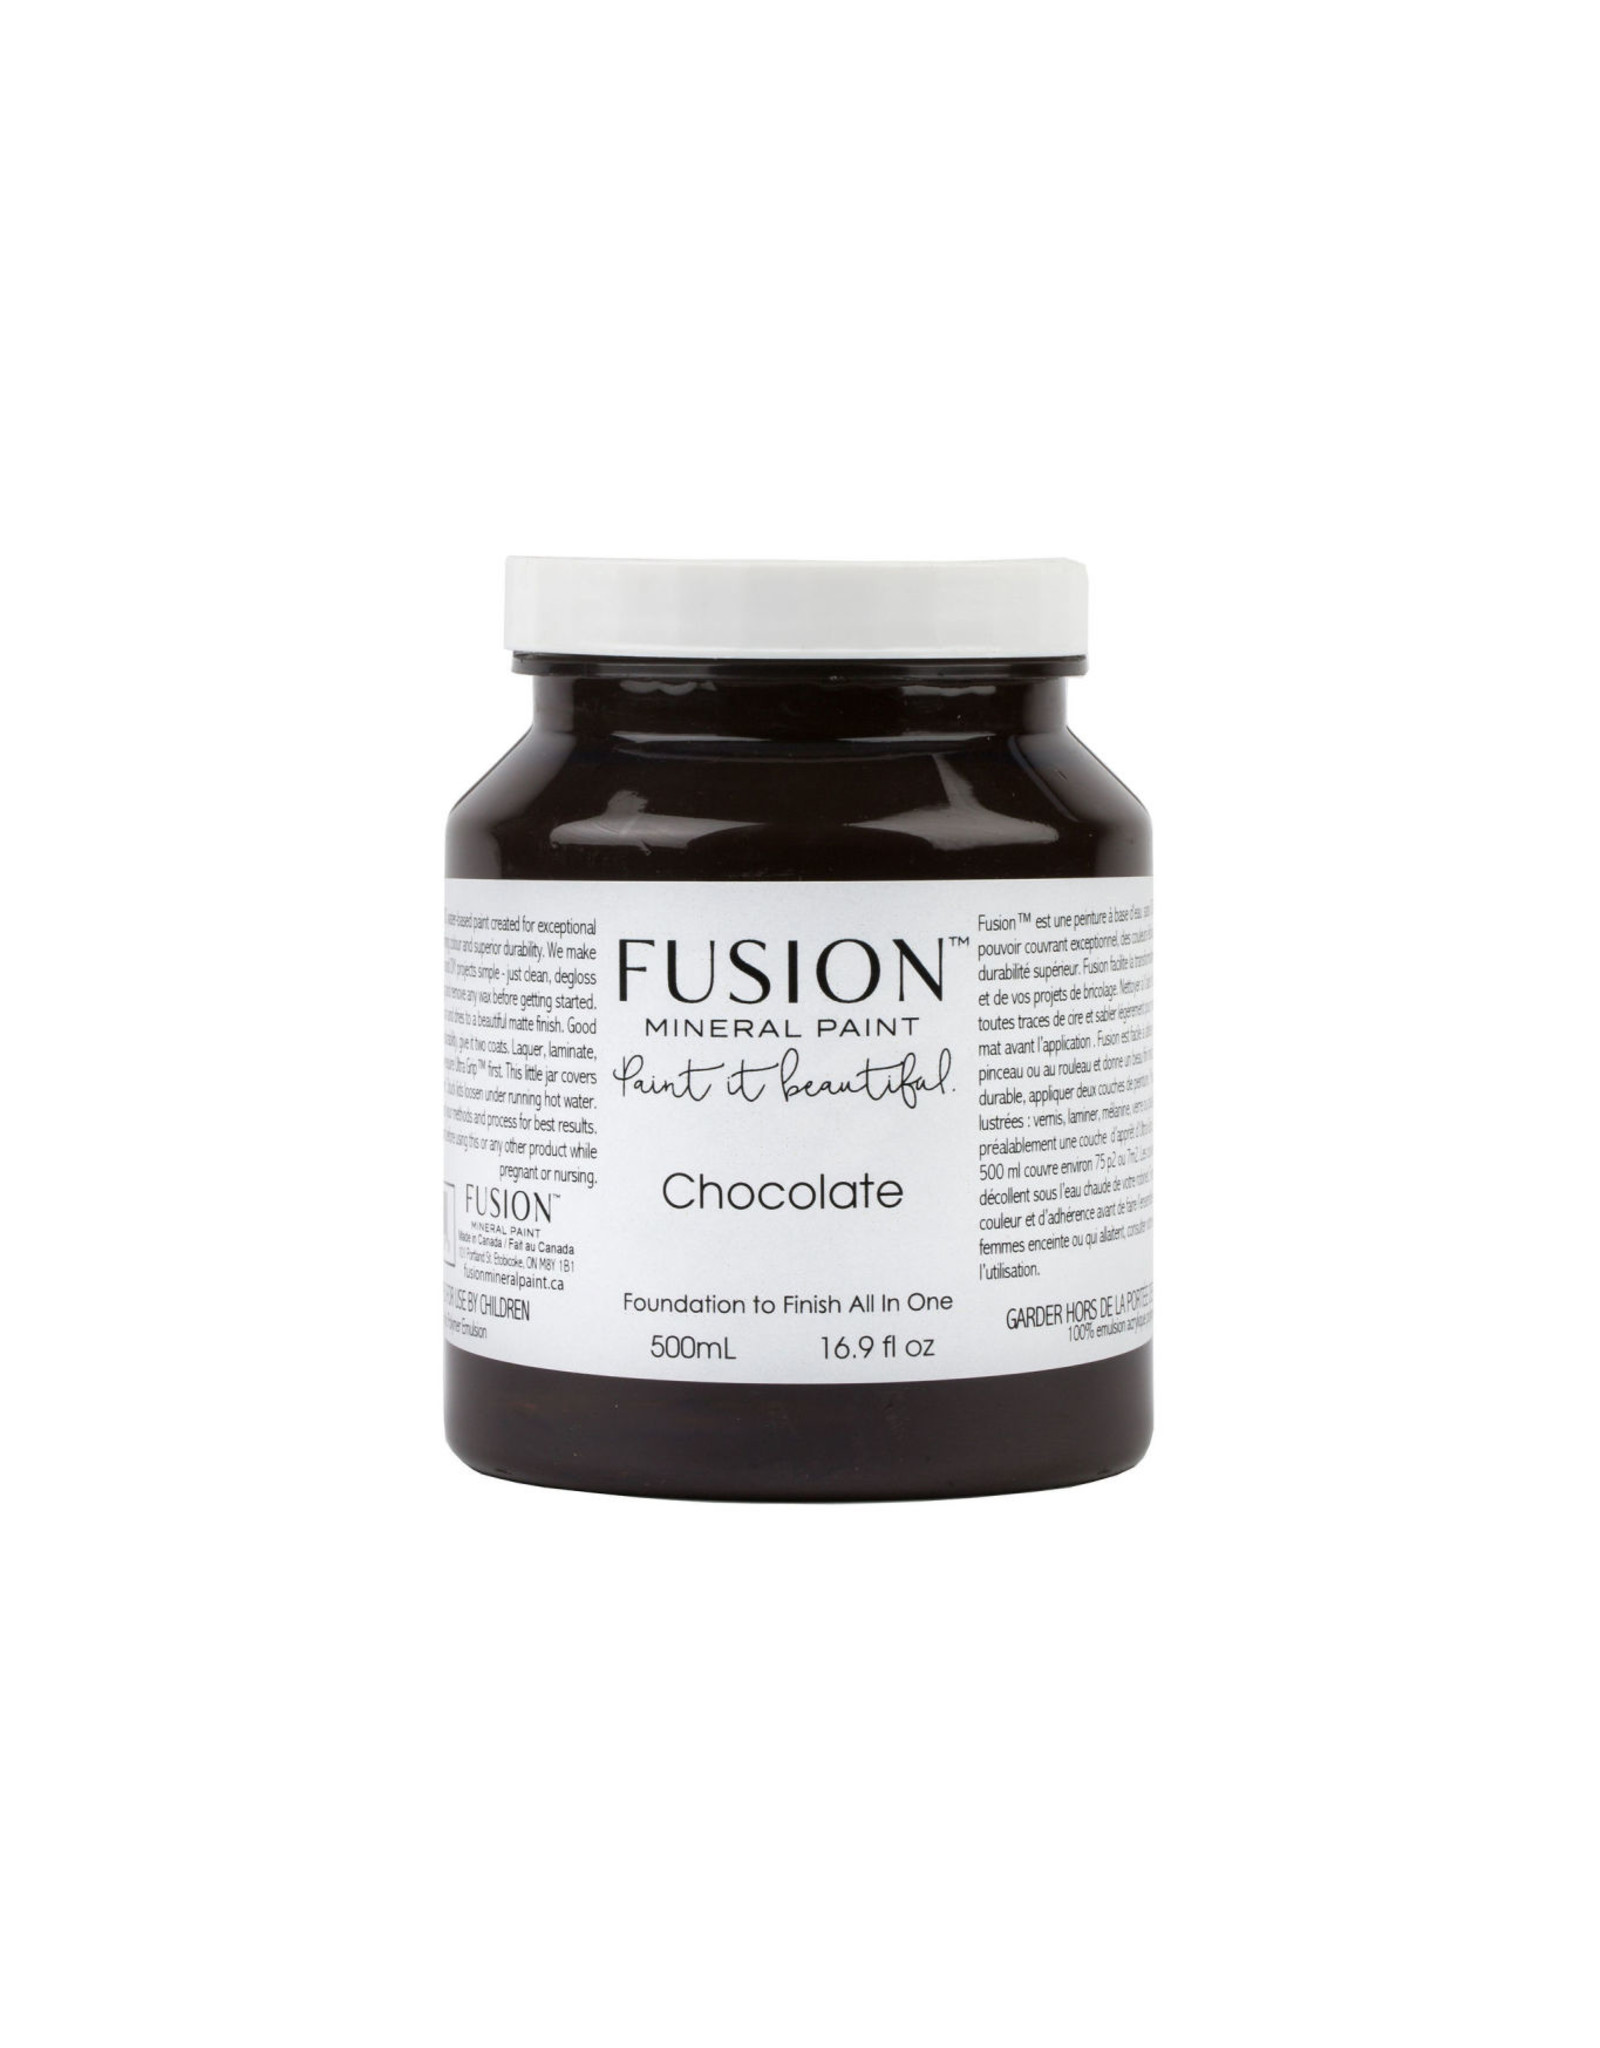 Fusion Mineral Paint Fusion Mineral Paint - Chocolate 500ml